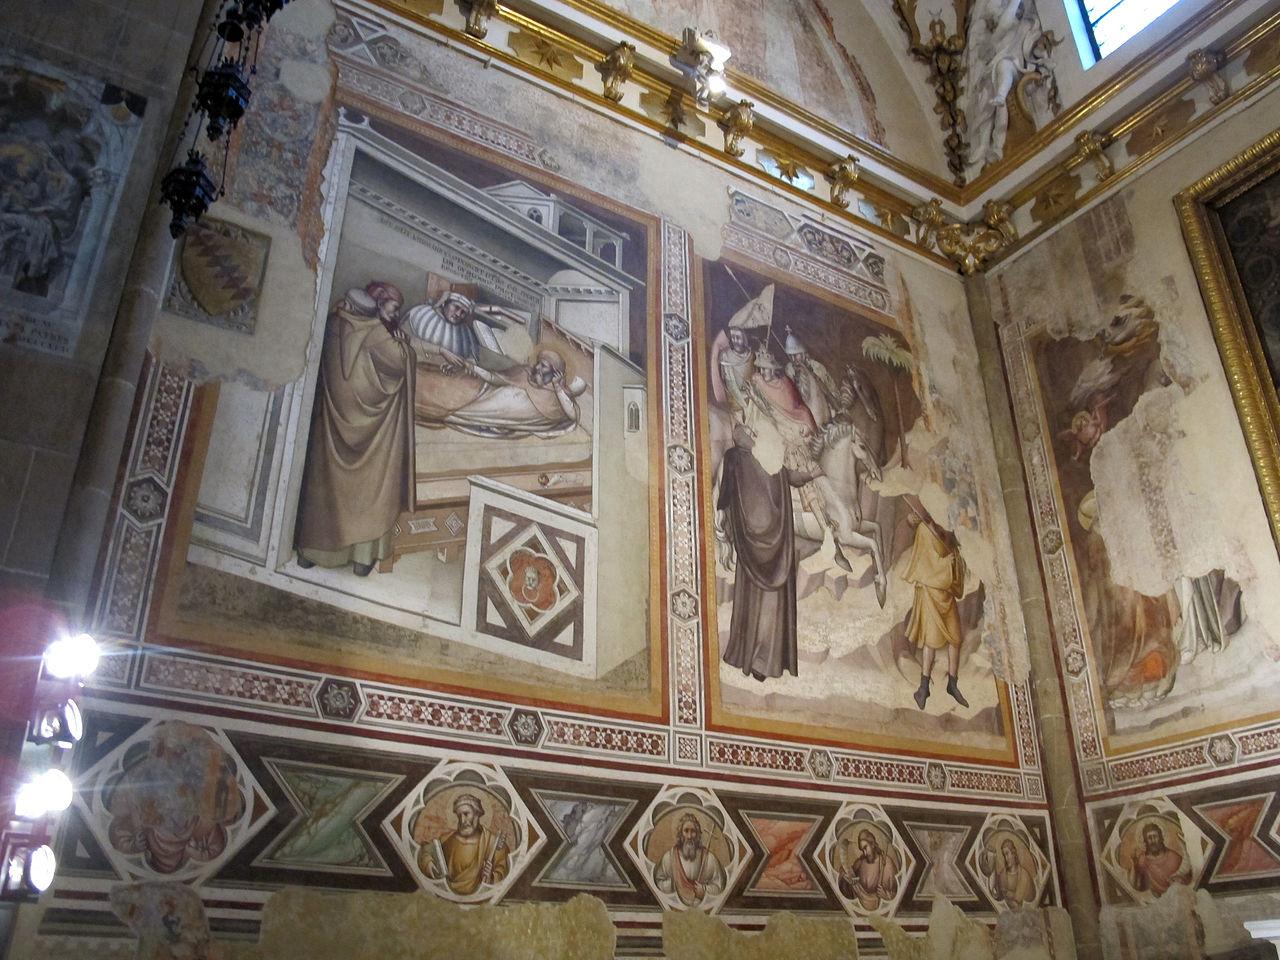 FileCappella bardi di smn affreschi di pseudo dalmasio